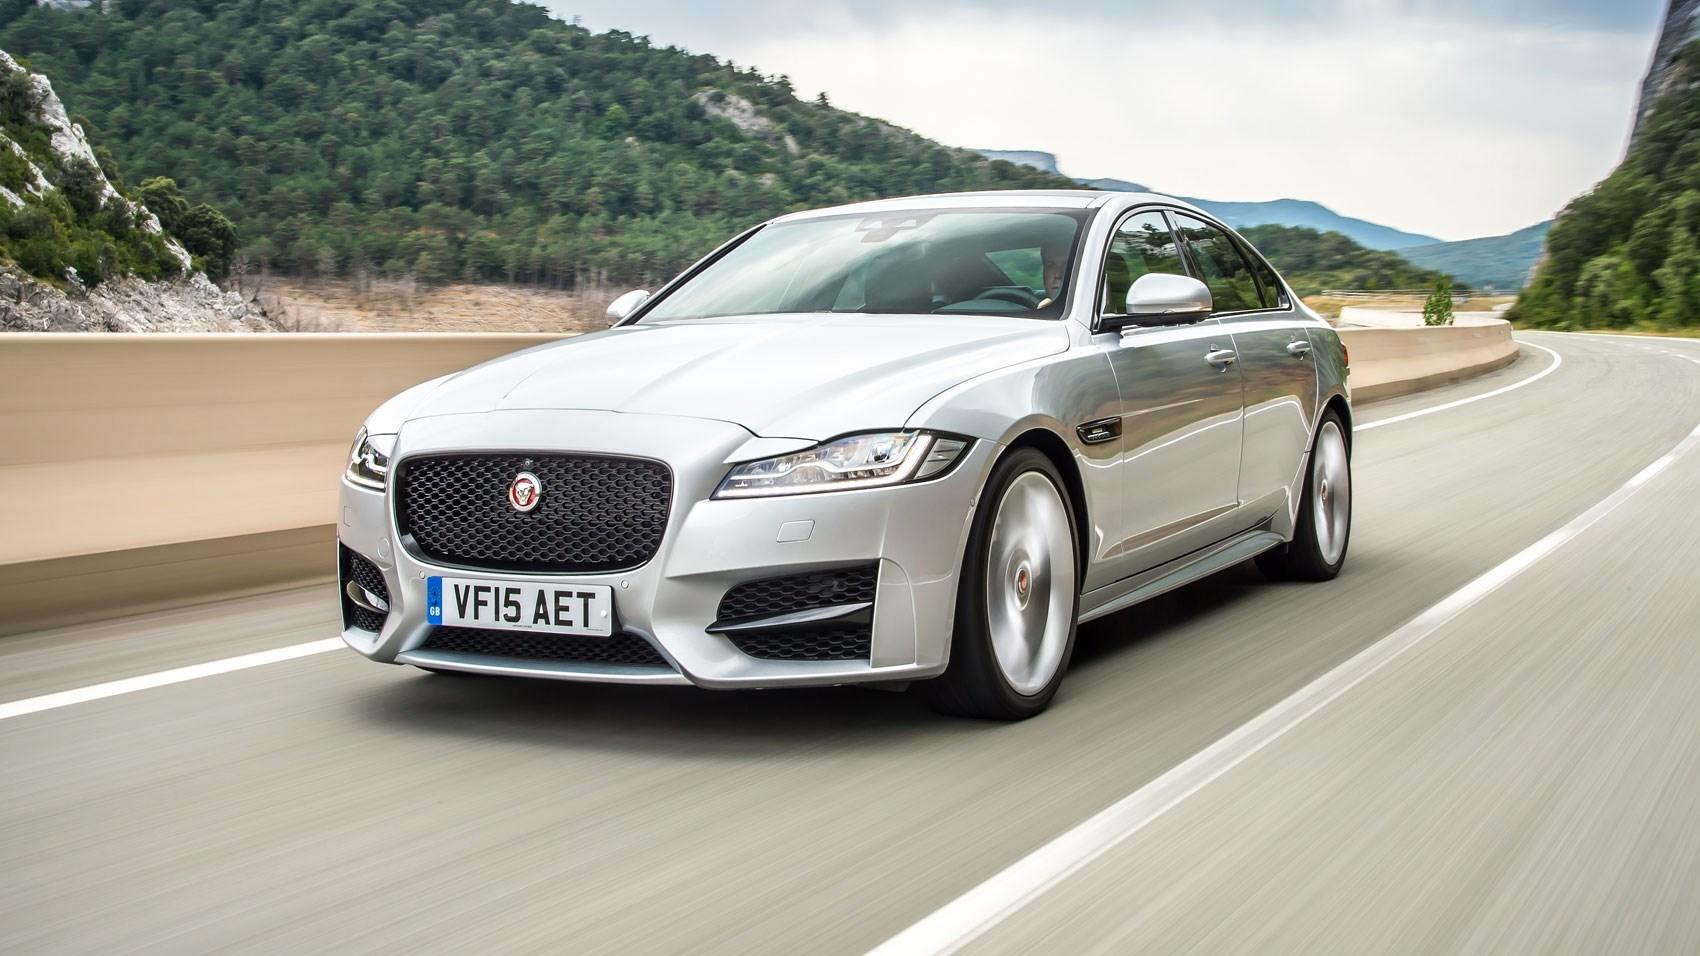 Jaguar xf lease deal